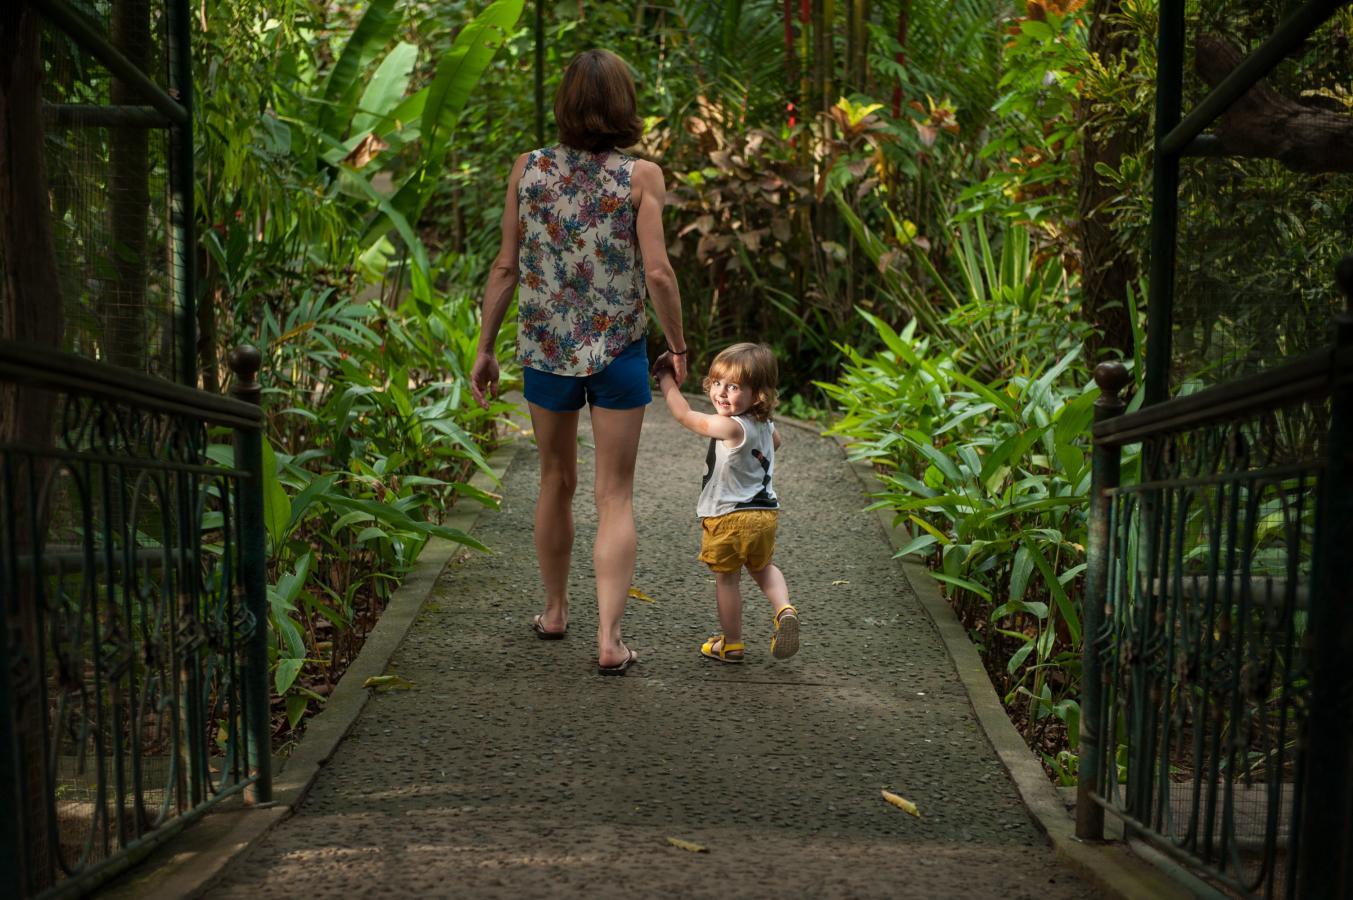 billie-at-the-bali-zoo-singapadu-bali-2013